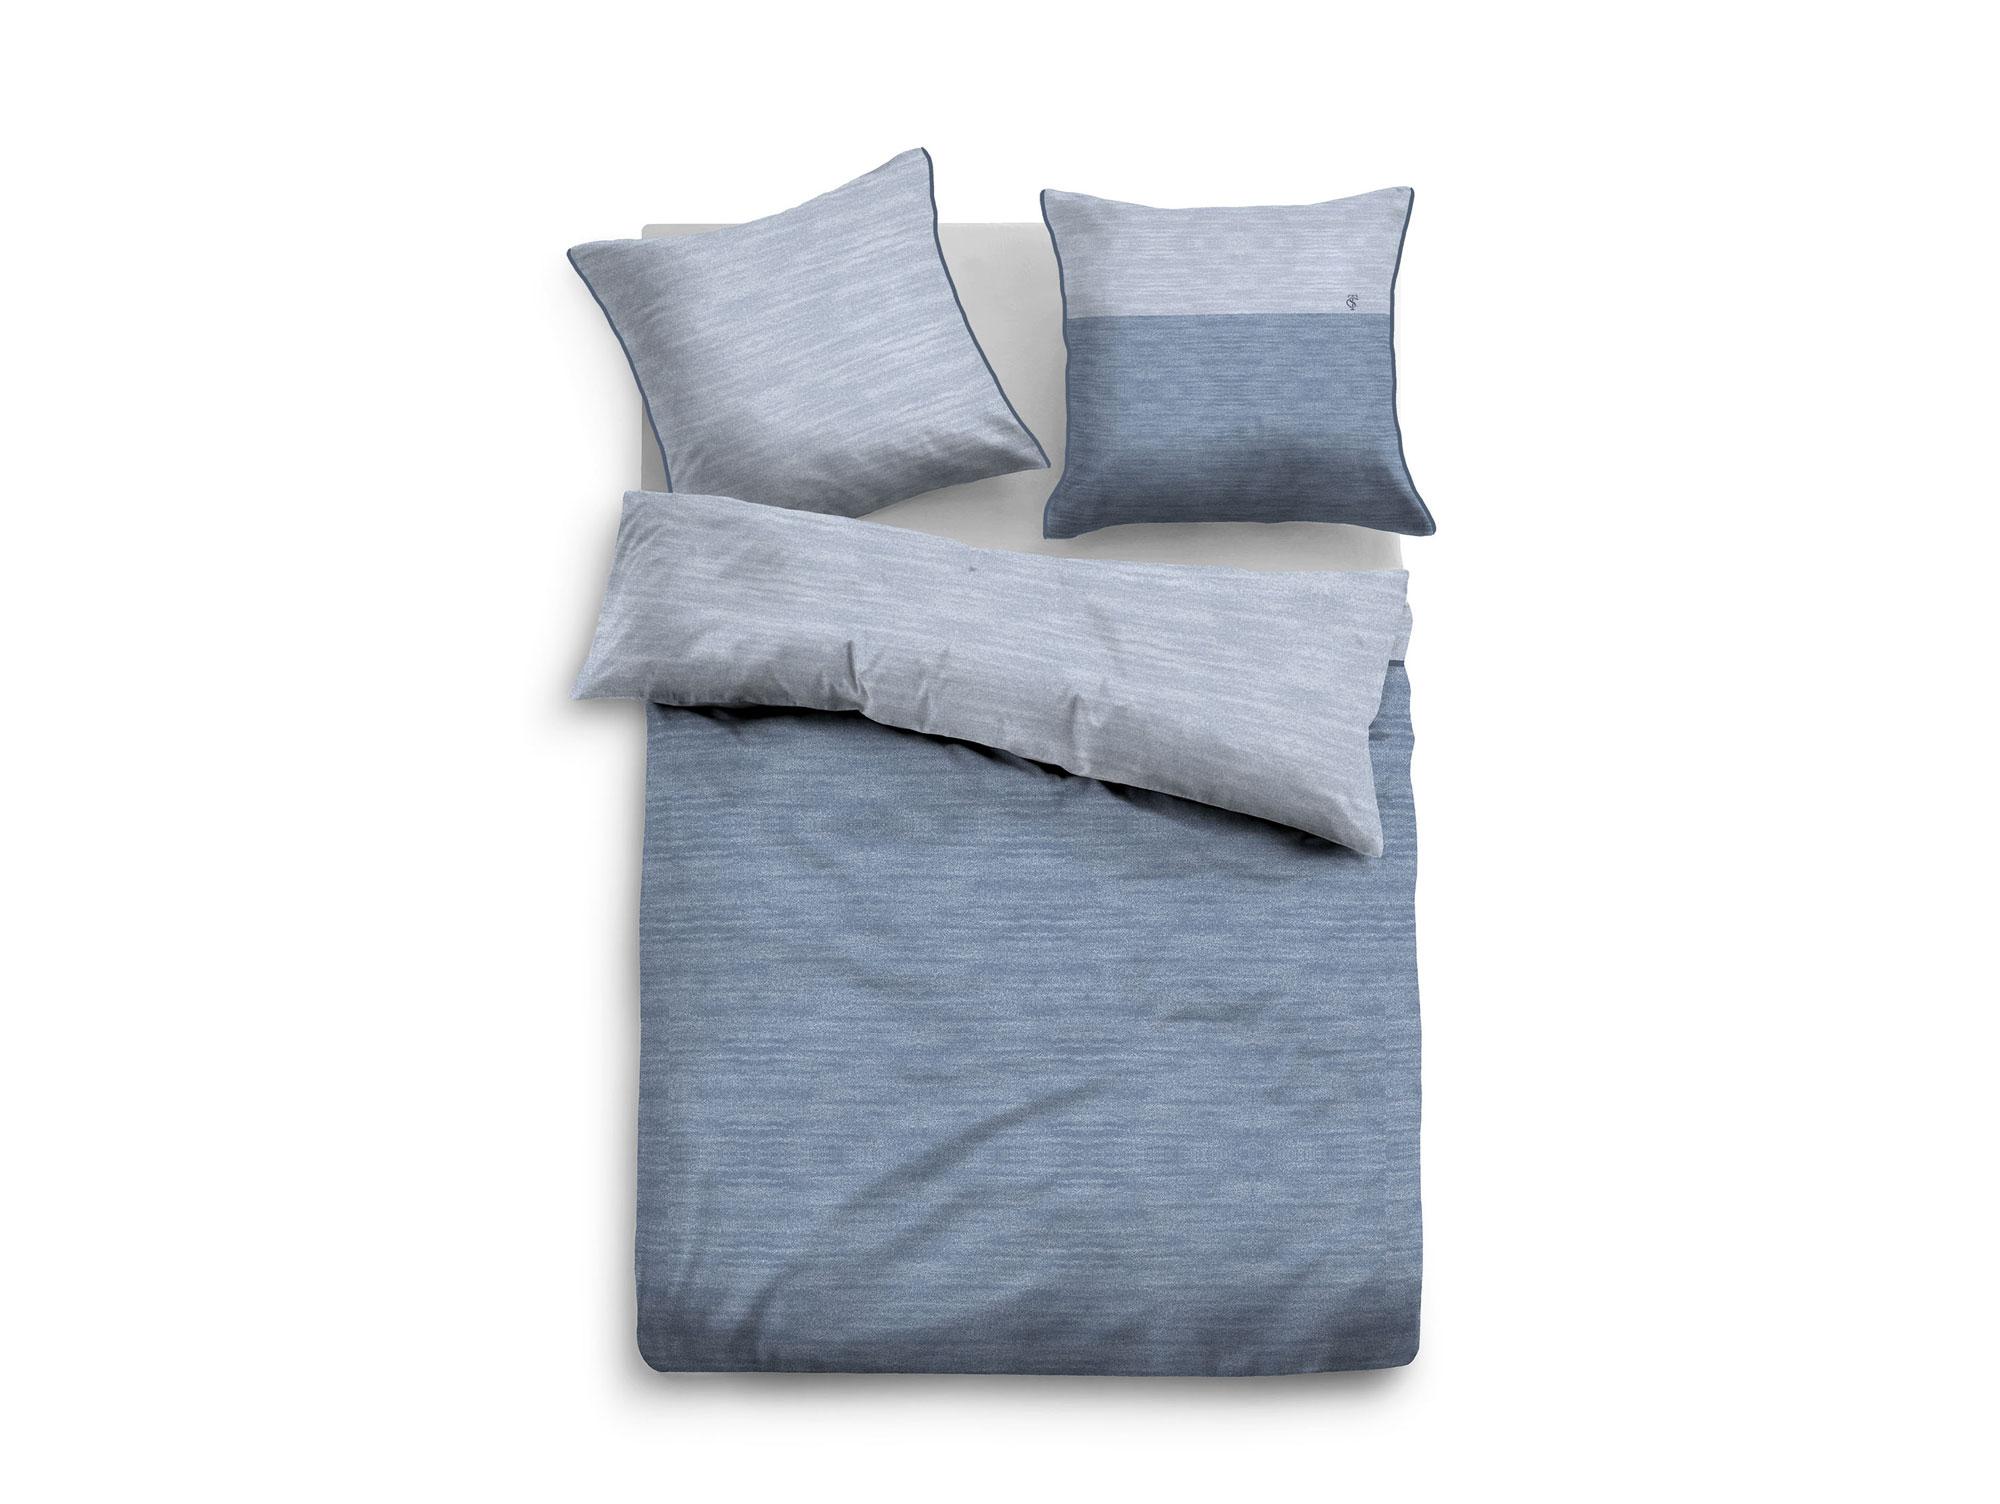 tom tailor bettw sche melange satin blau 135x200 80x80. Black Bedroom Furniture Sets. Home Design Ideas